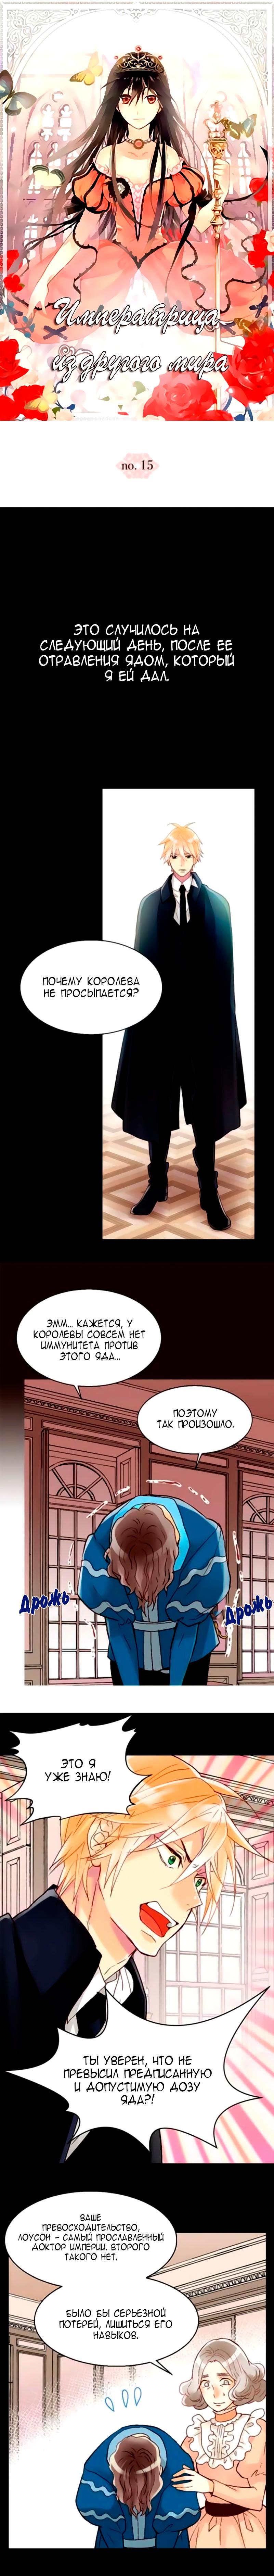 https://r2.ninemanga.com/comics/pic3/14/22798/1306820/1548602041633.jpg Page 2